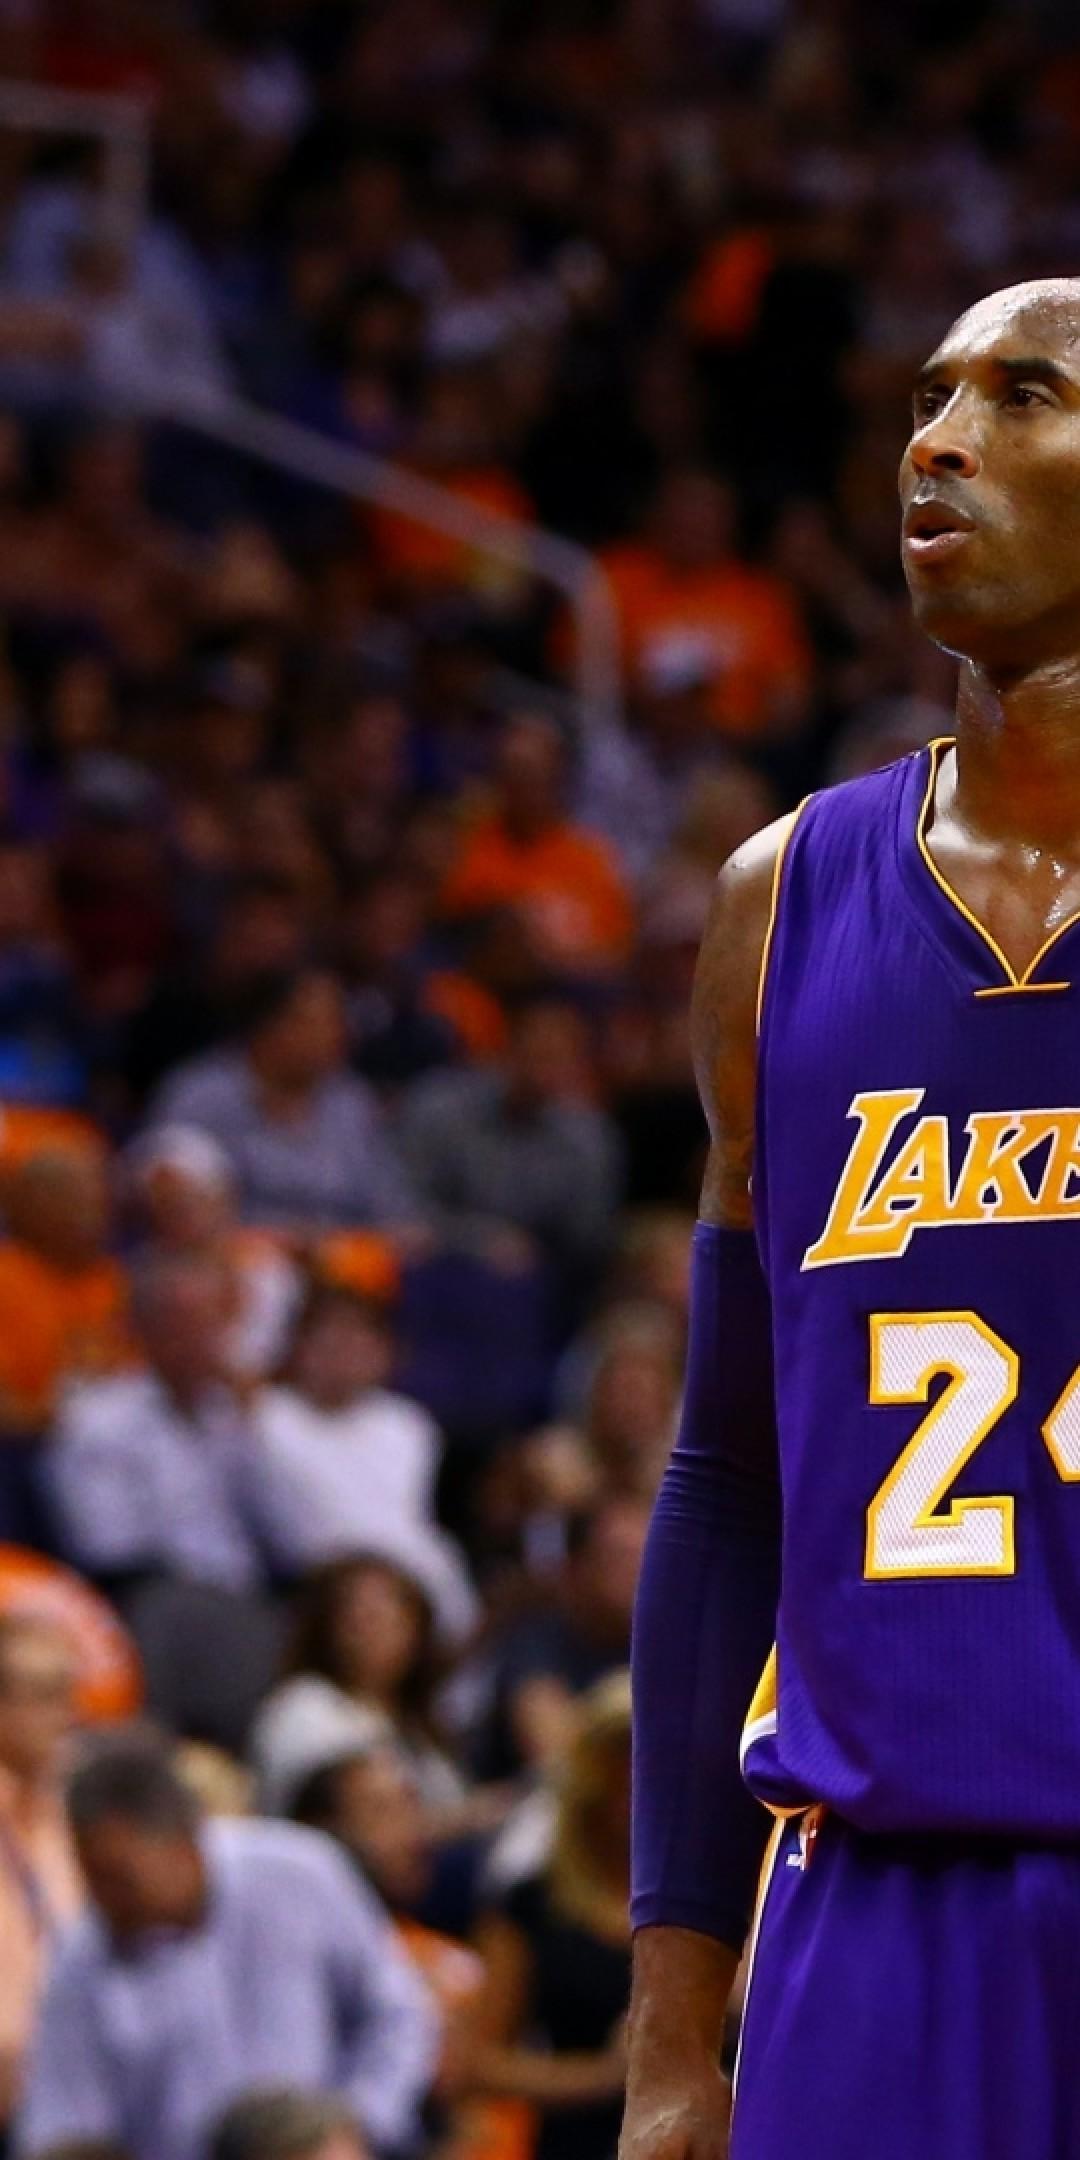 Kobe Bryant Basketball Los Angeles Lakers Nba Wallpaper For